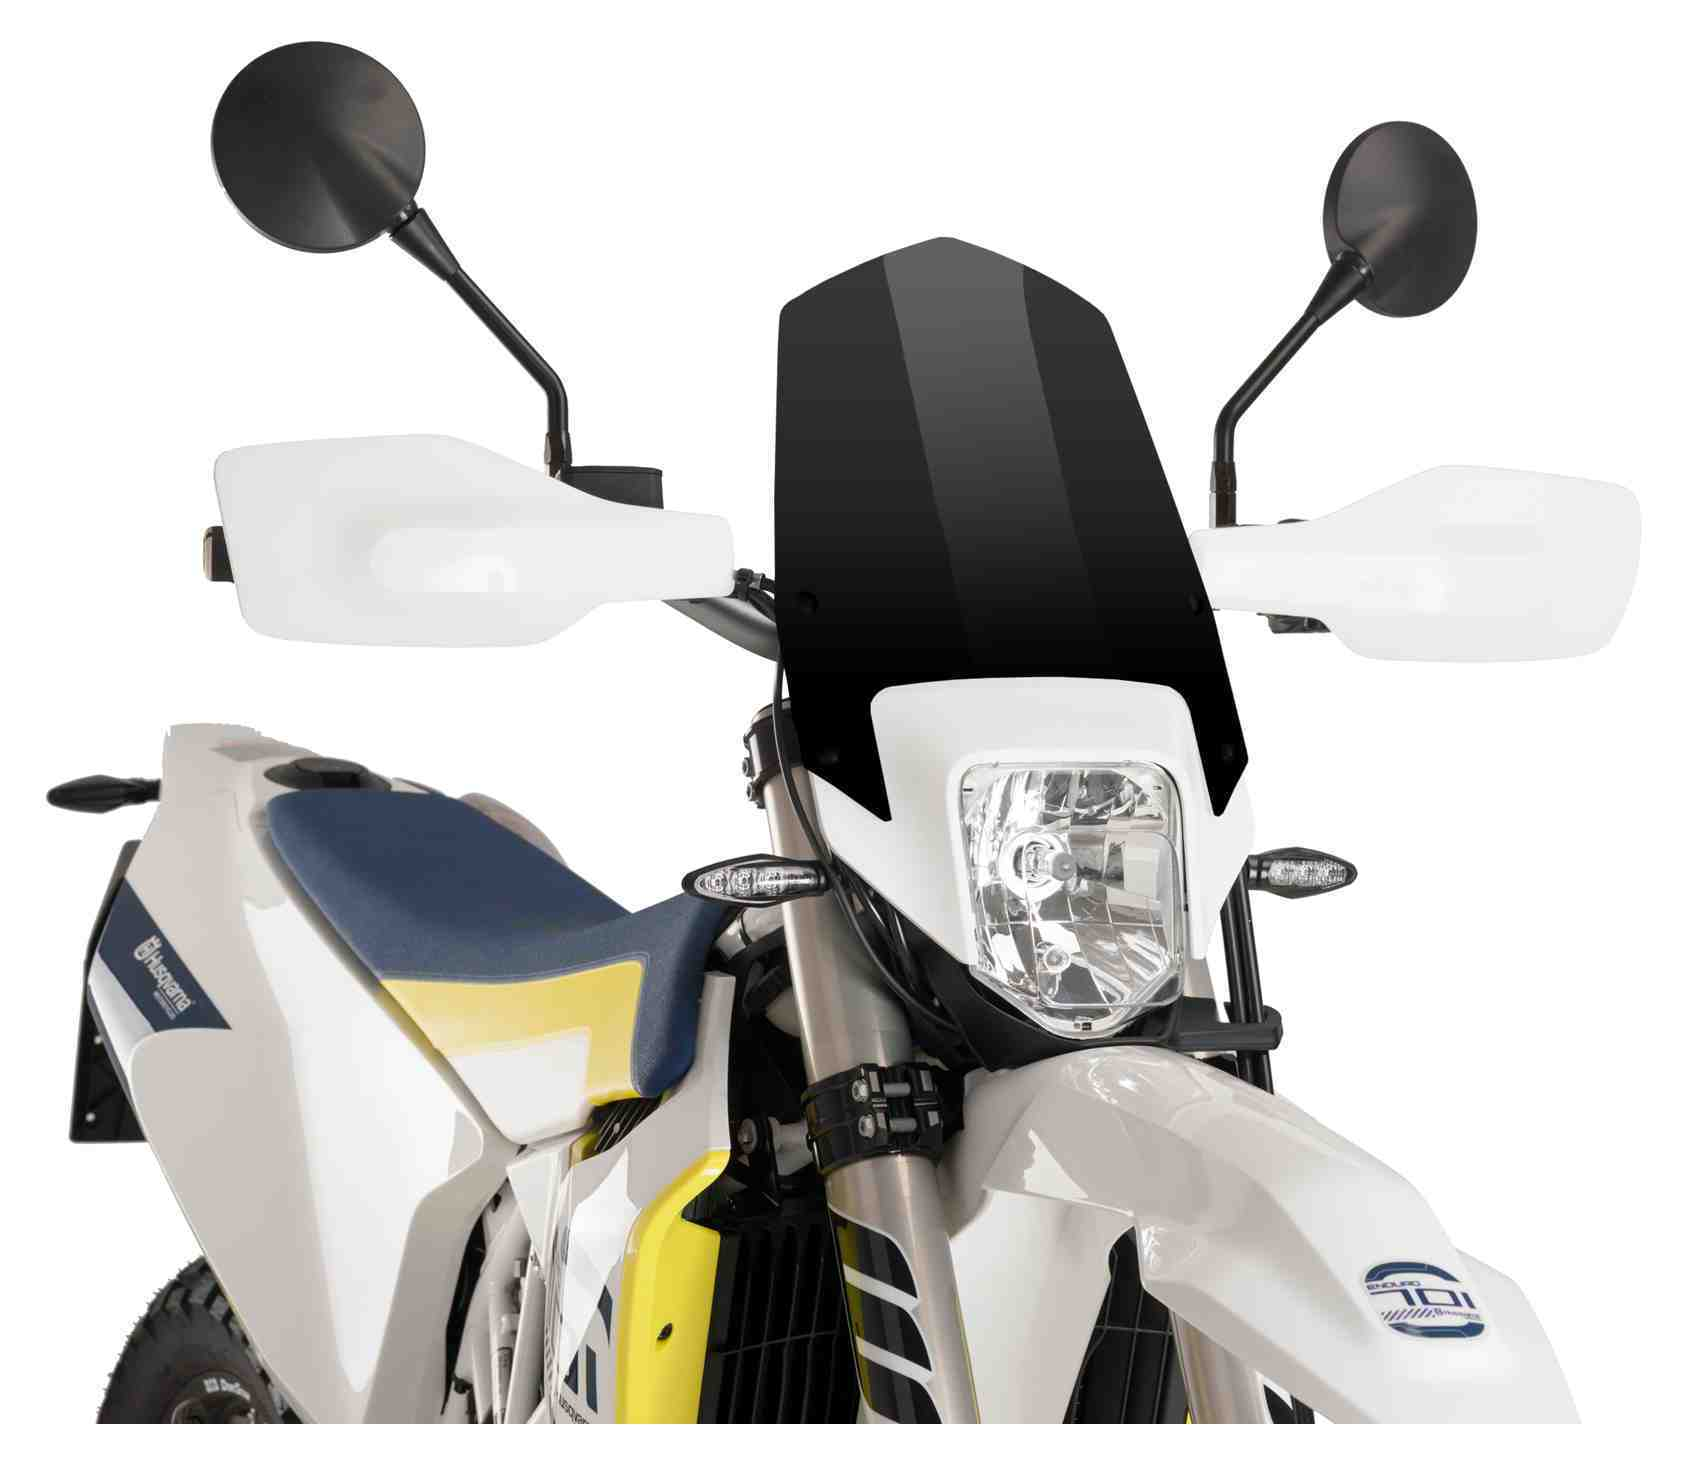 Ride the Husqvarna 701 Supermoto with RJ - YouTube